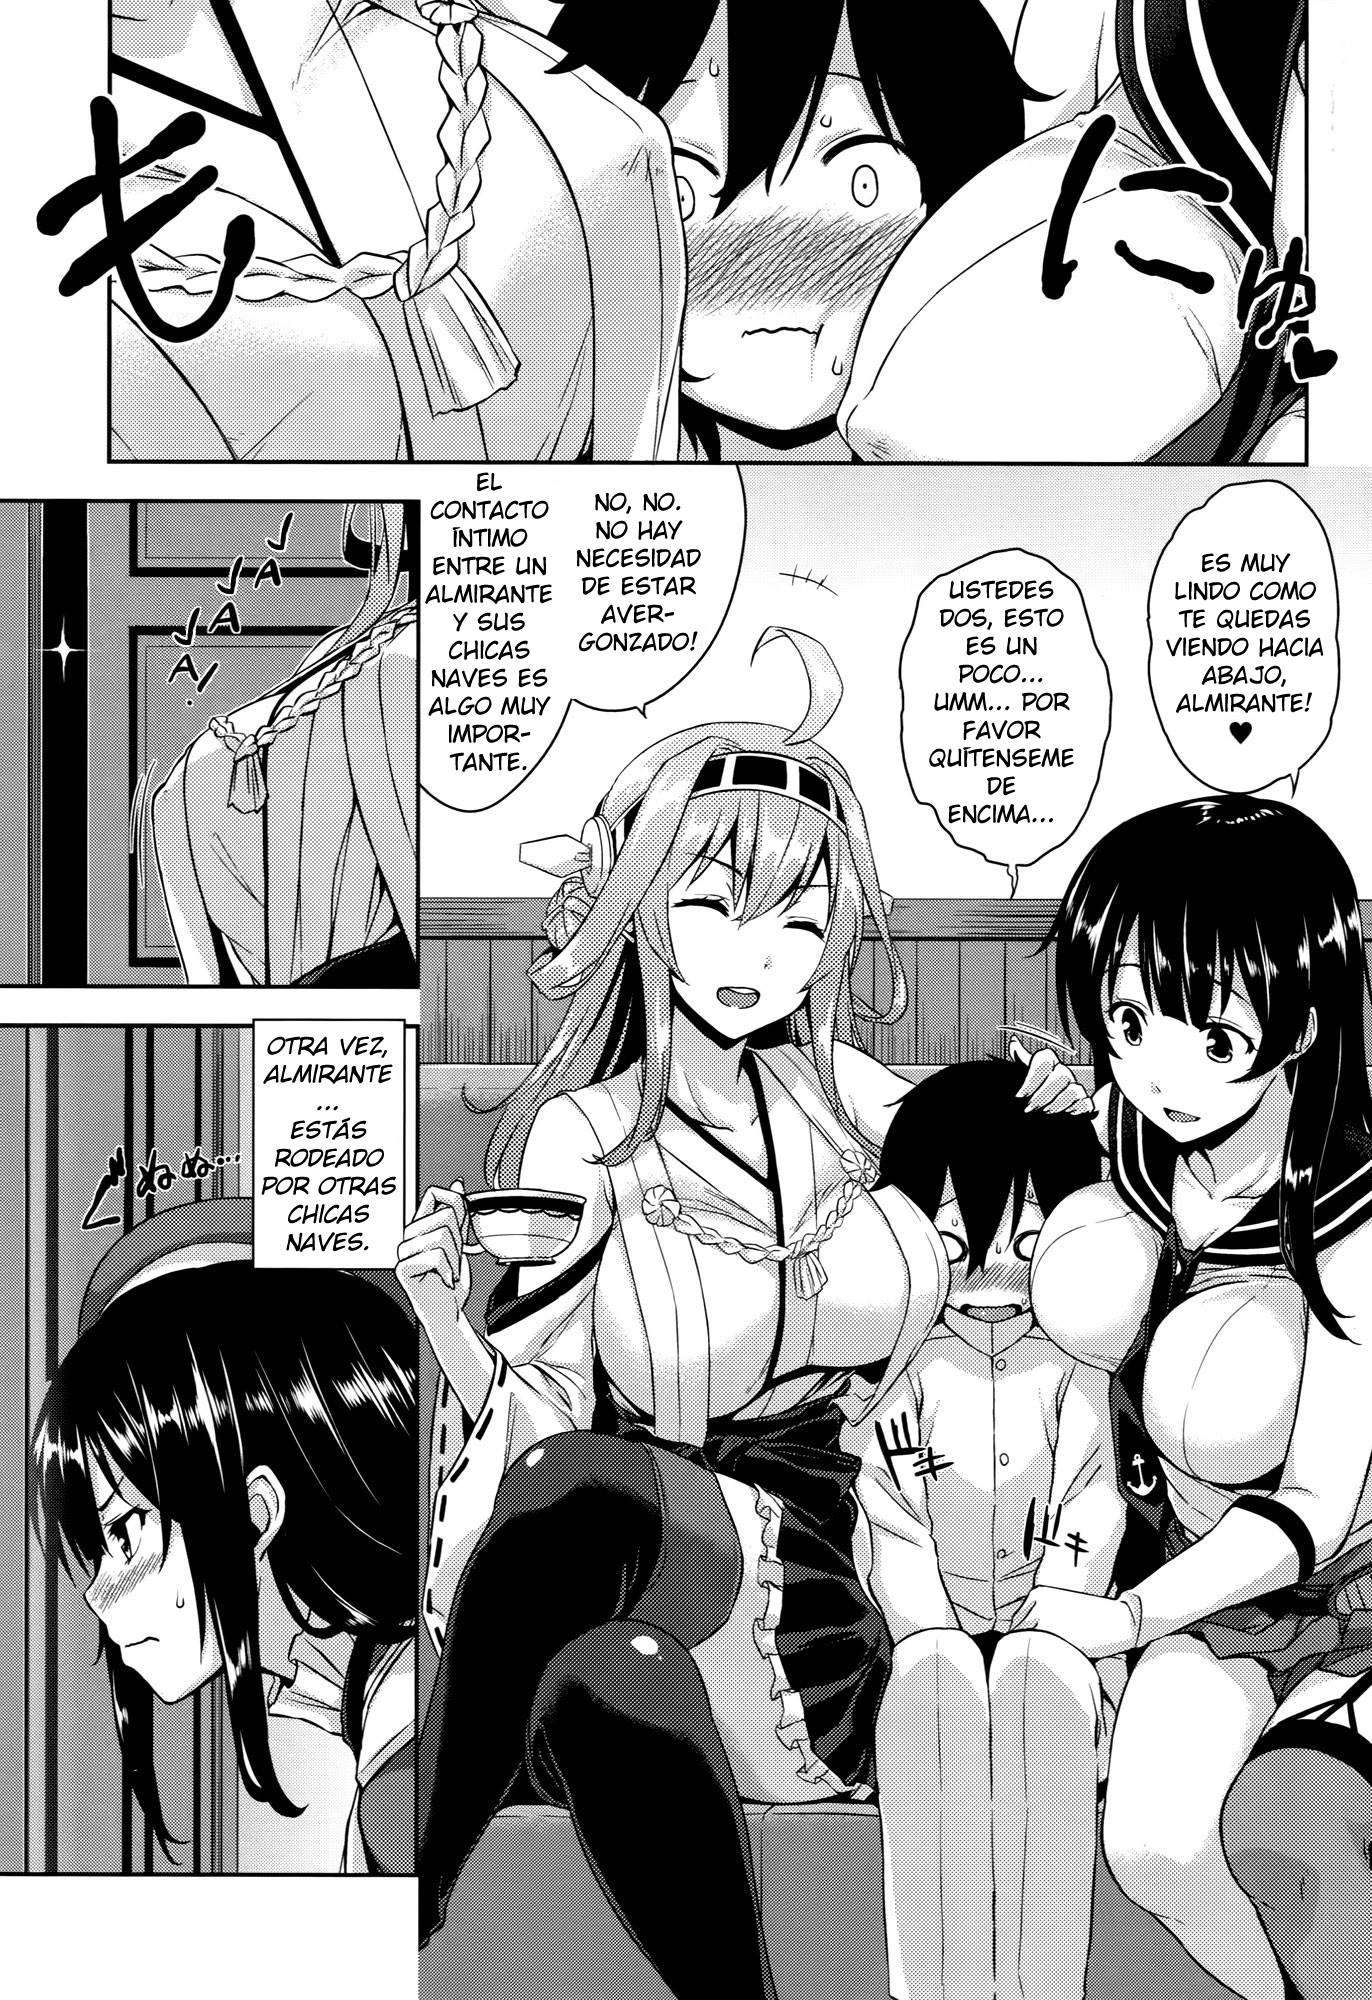 Takao Onee-san to Nyuukyo! Kai Ni Chapter-1 - 2